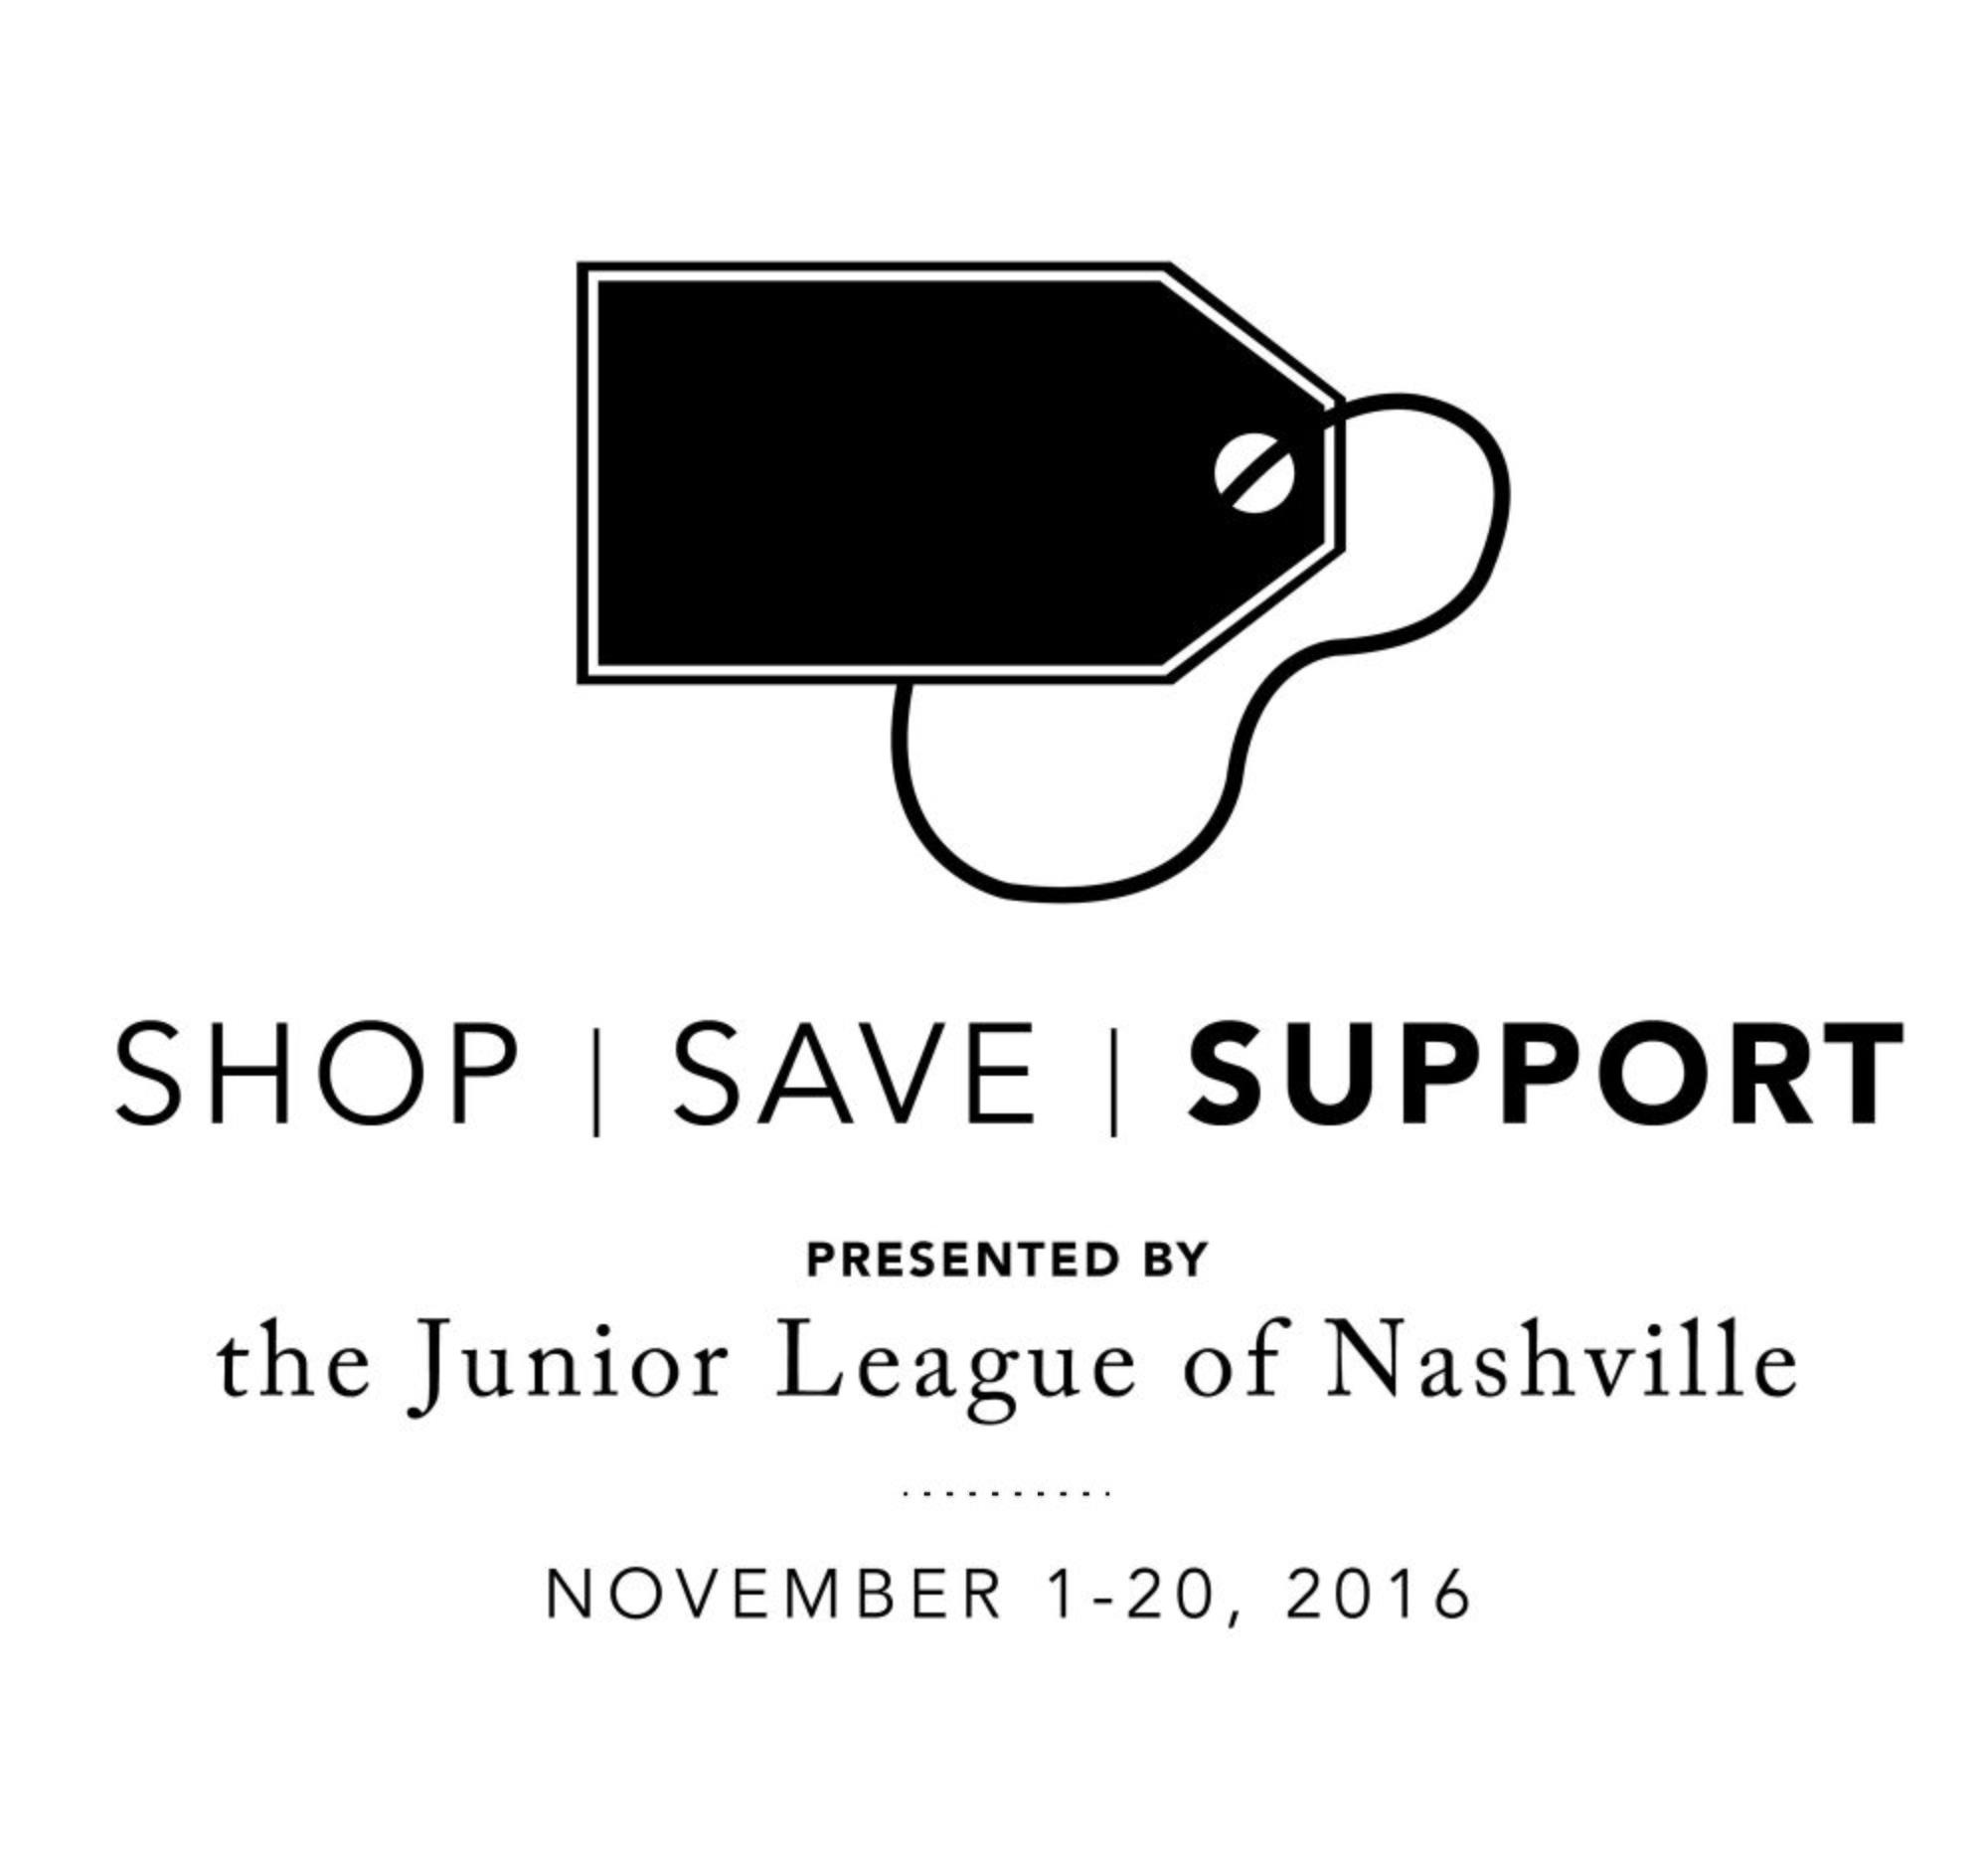 Junior League of Nashville